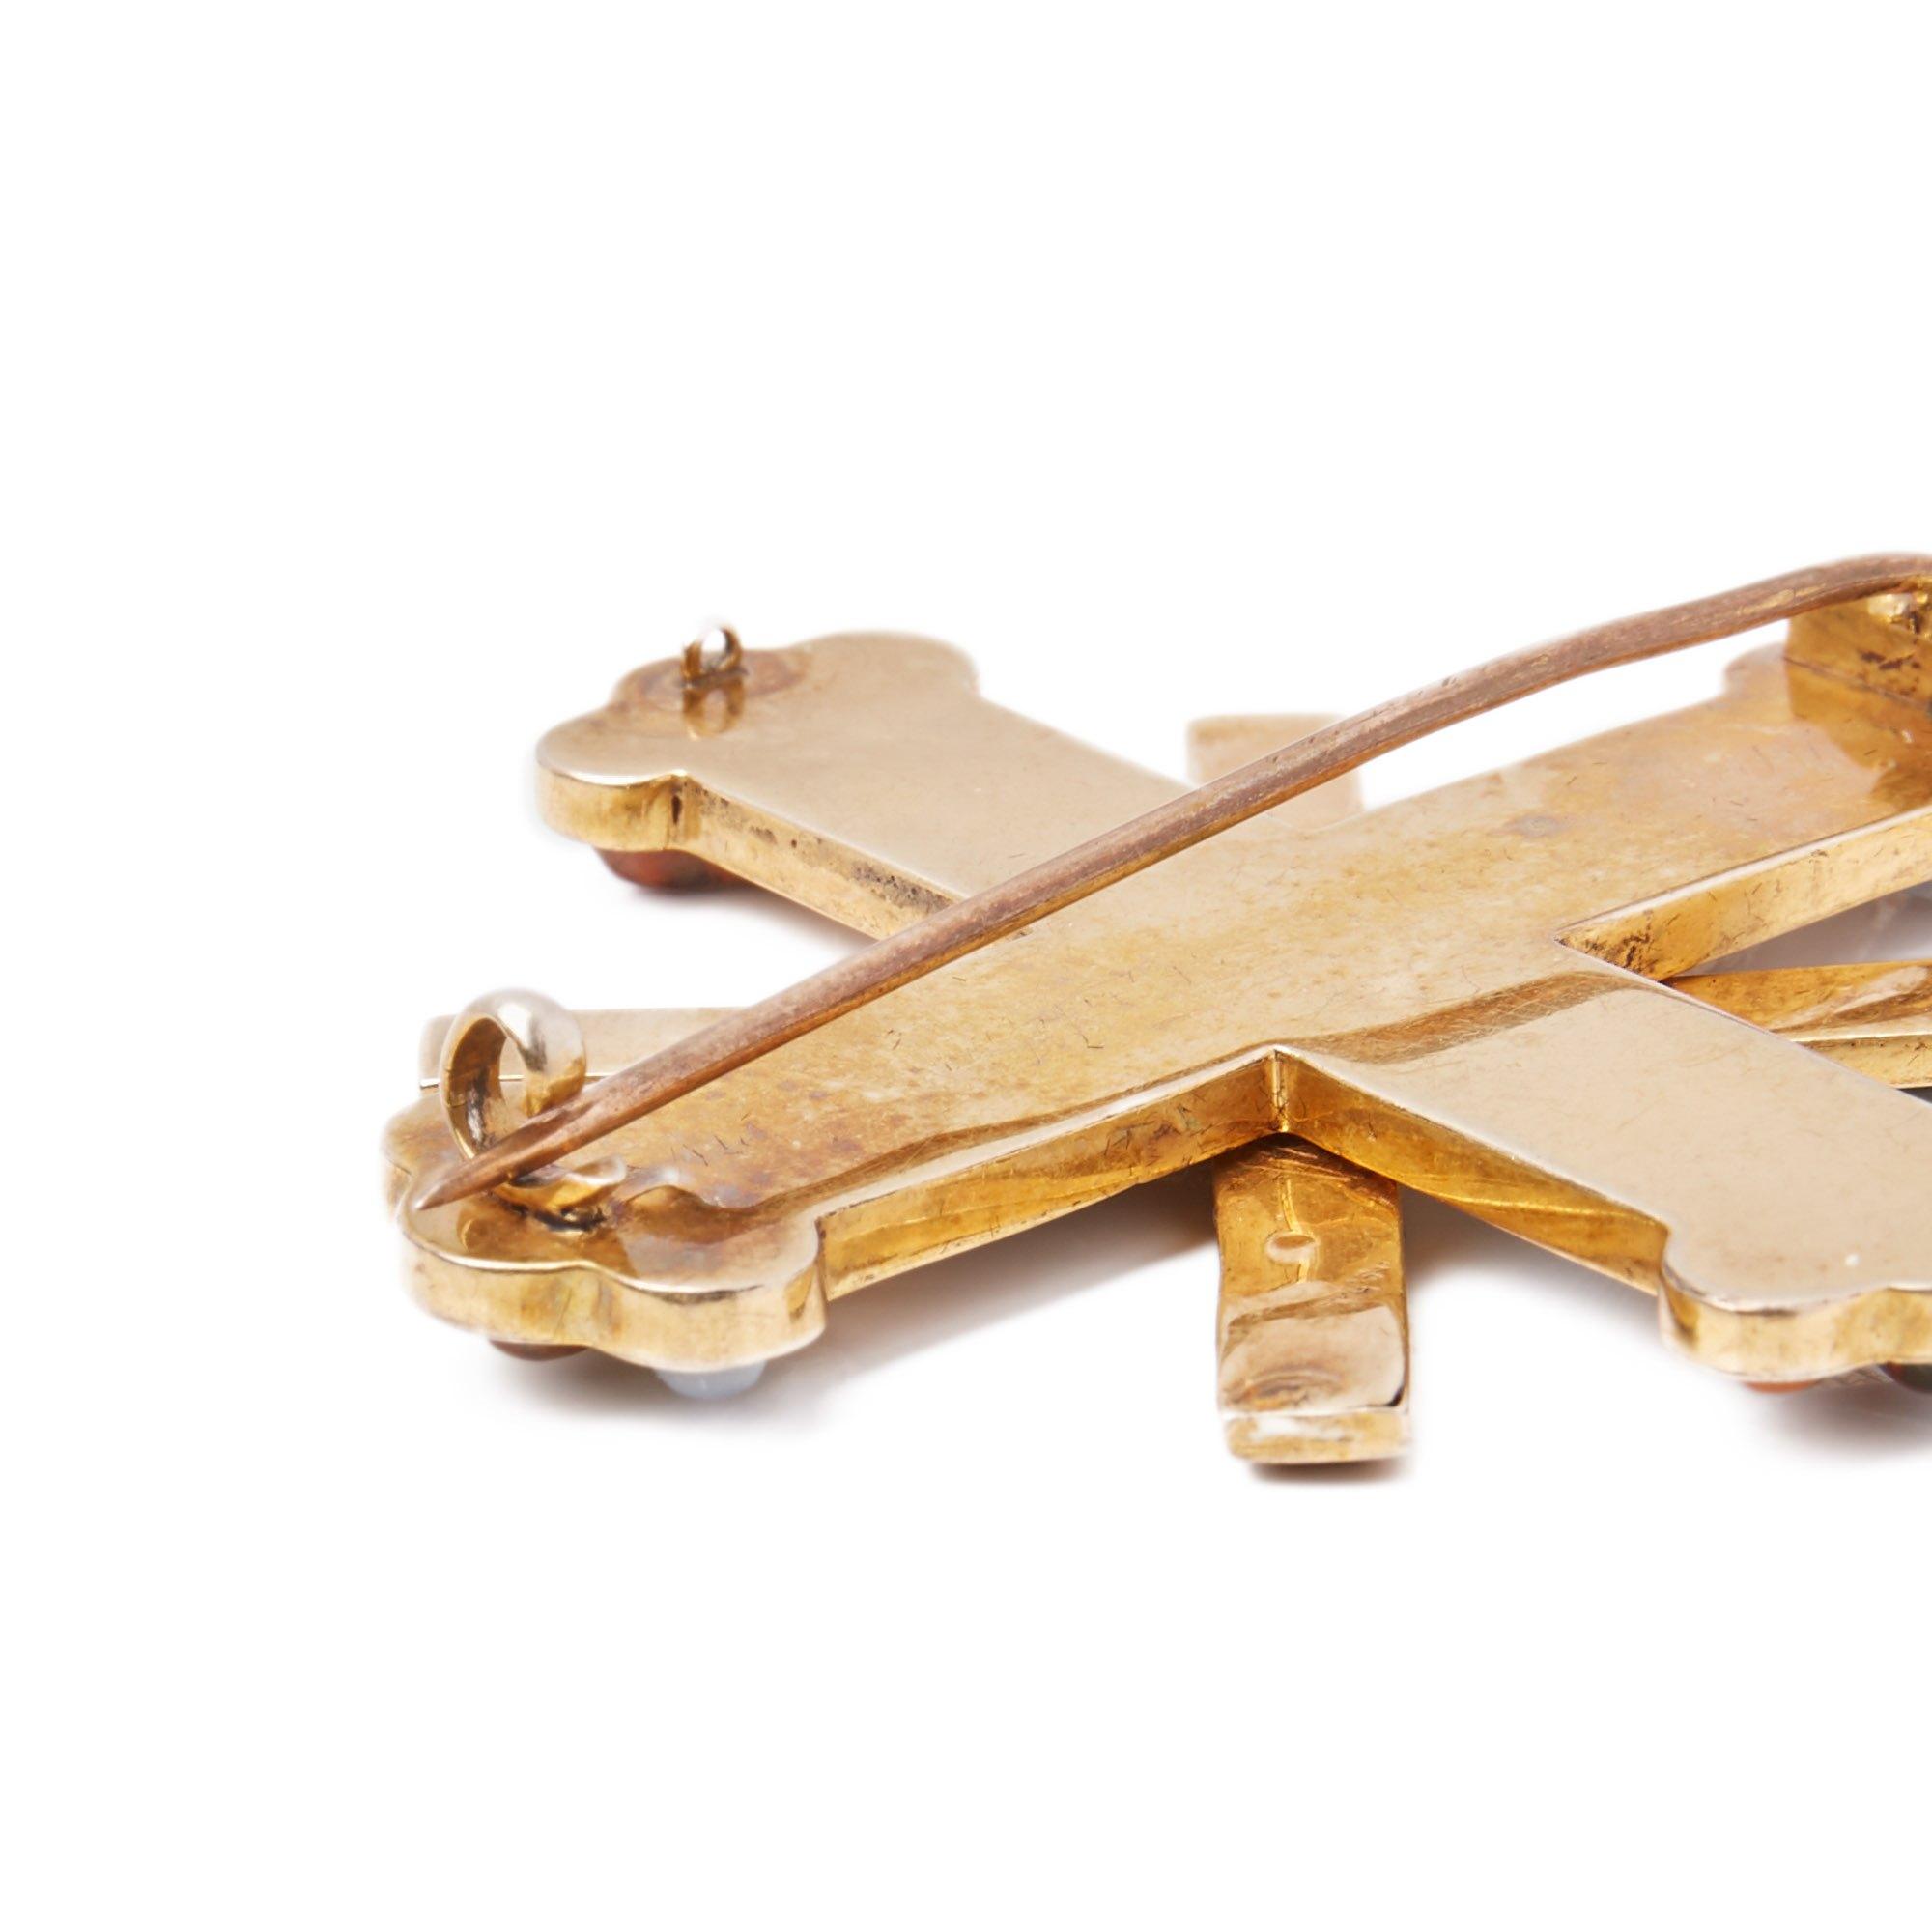 Agate RARE SCOTTISH OVERLAPPING CROSSES HARDSTONE GOLD BROOCH 19 C.